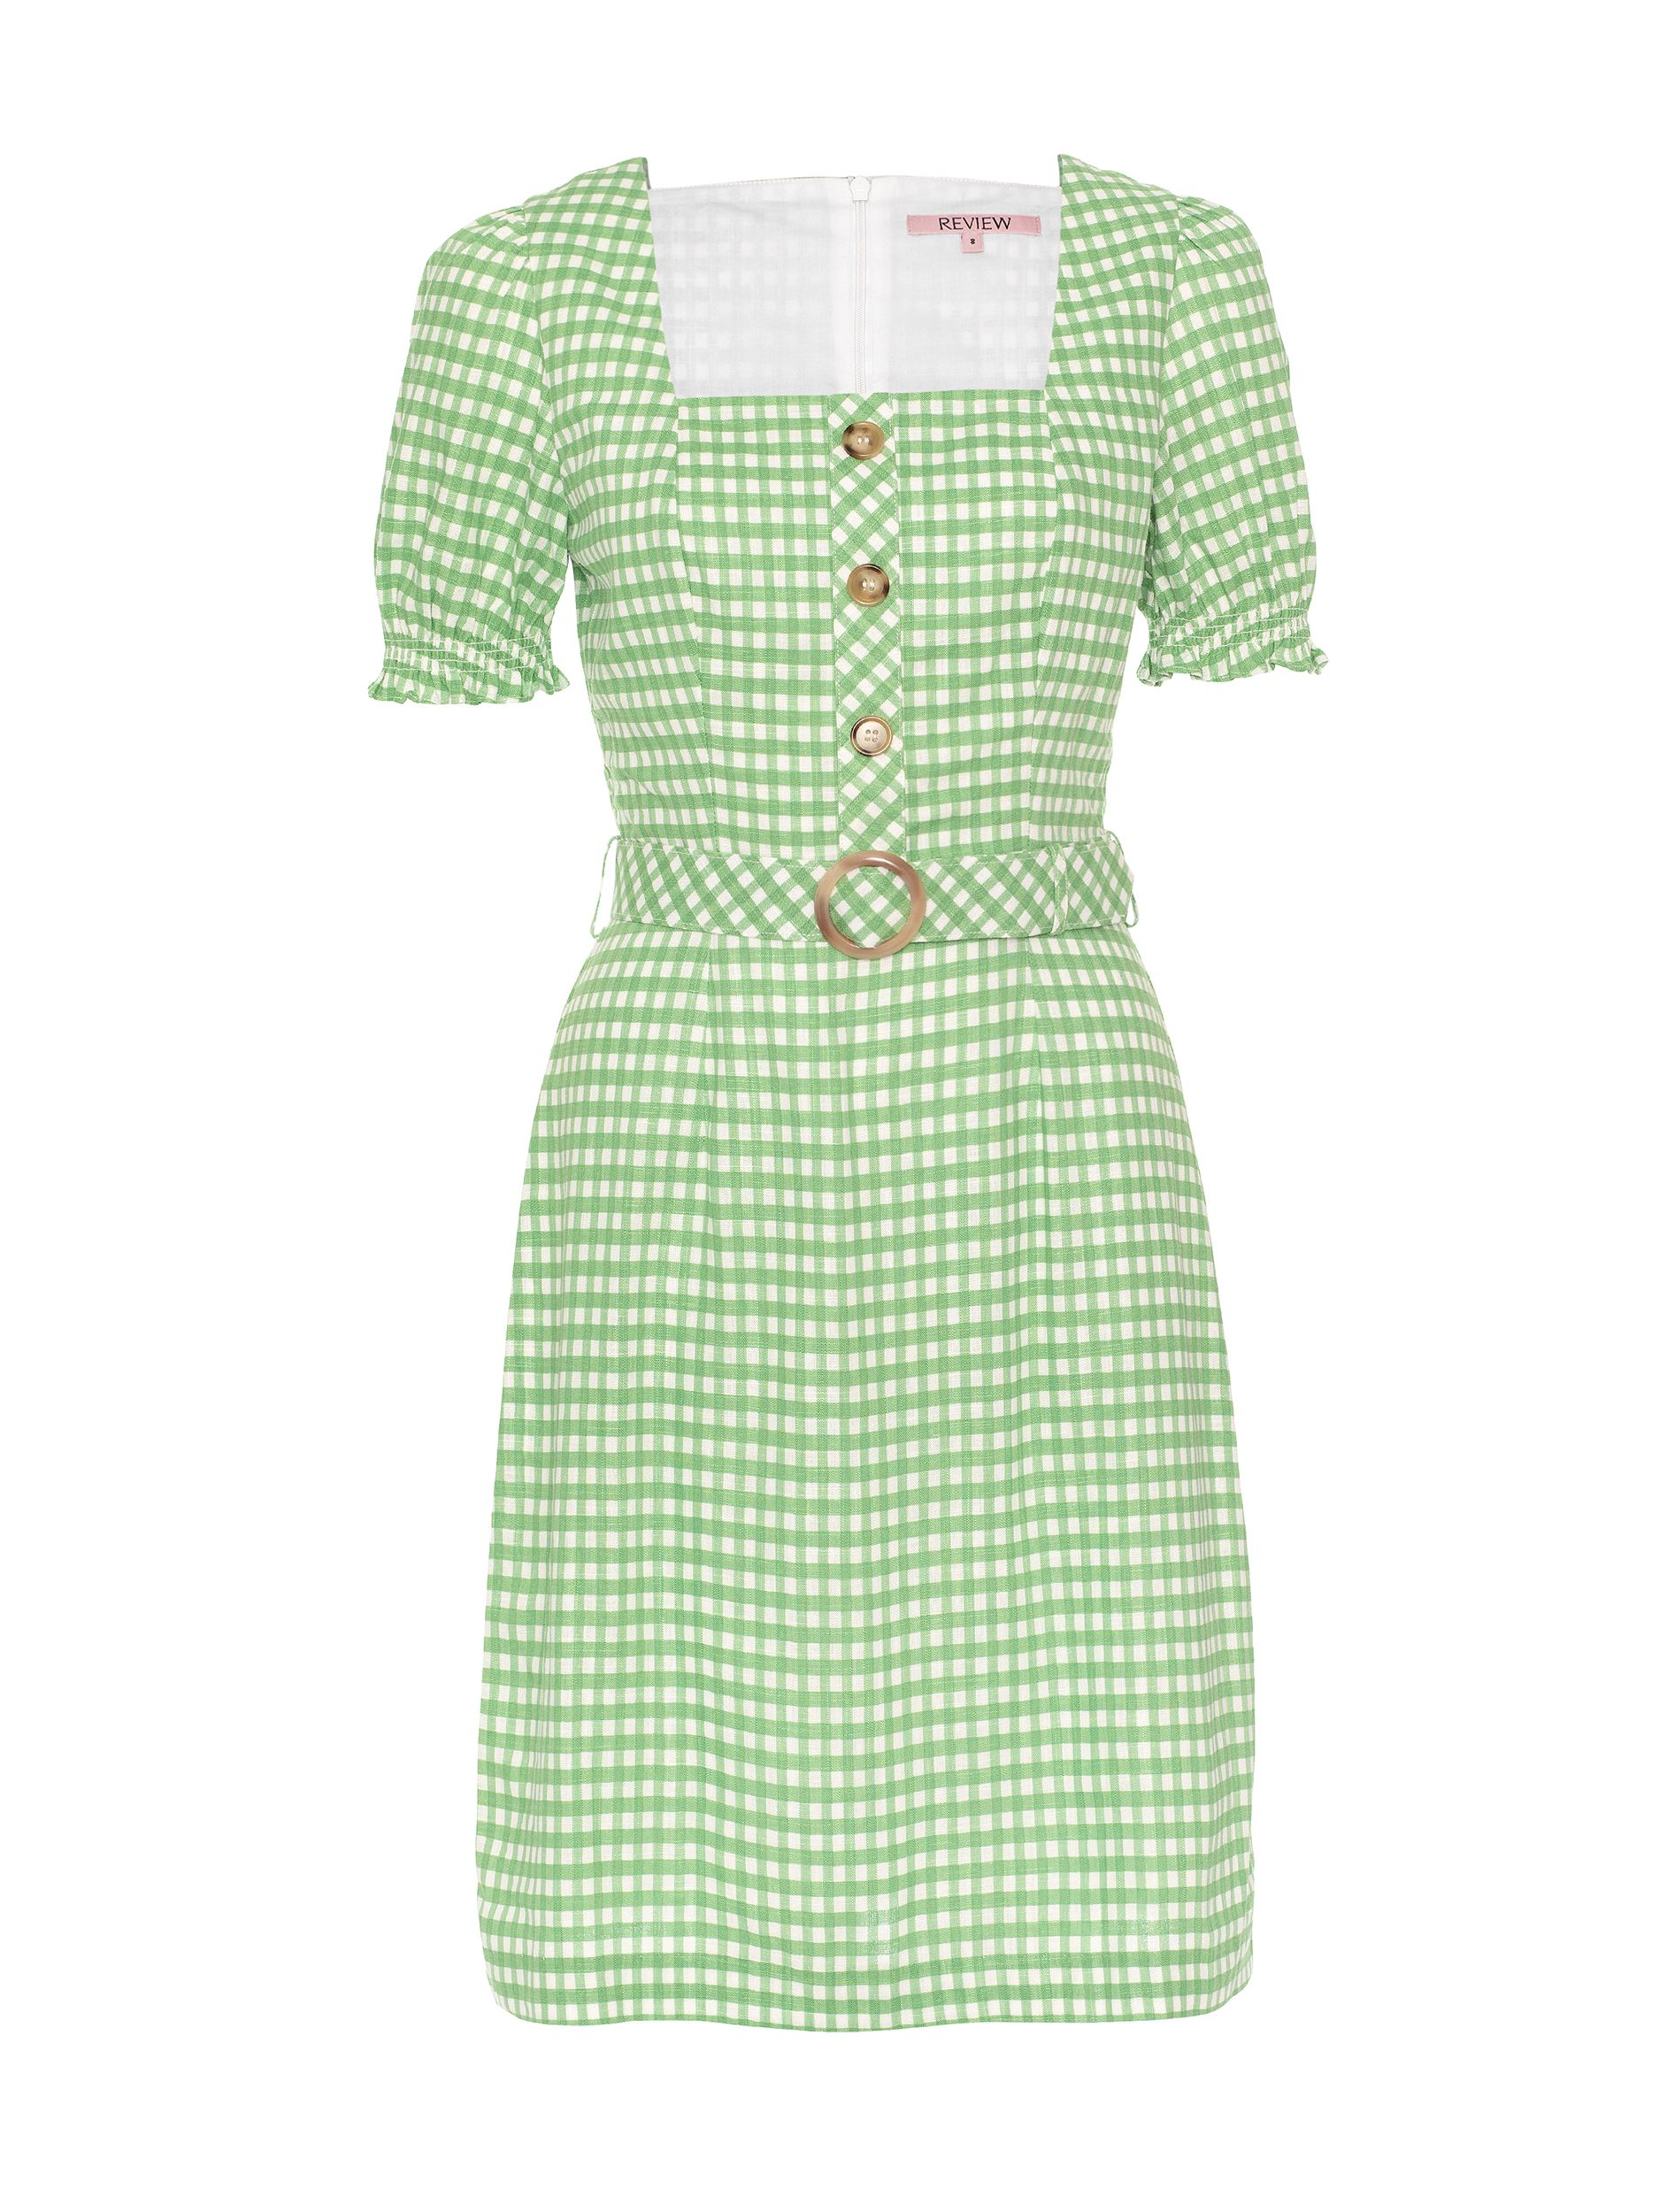 Well Plaid Dress Review Australia Review Clothing Australia Clothes Dresses [ 2500 x 1875 Pixel ]